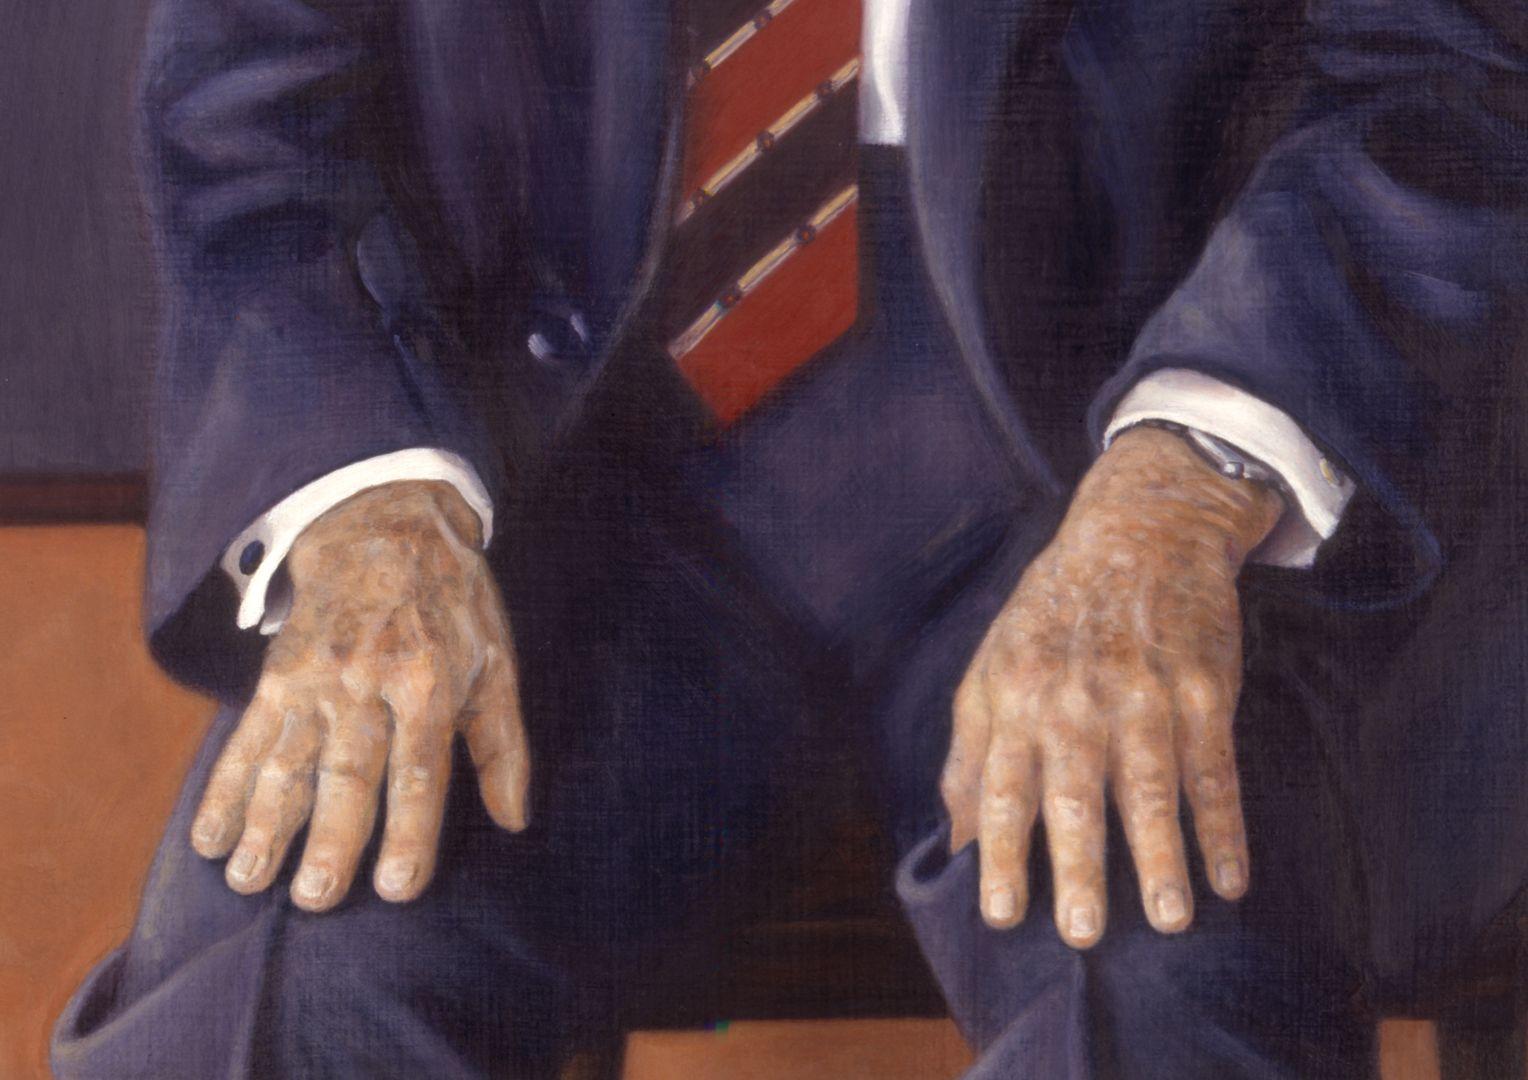 Dr. Andreas Urschlechter Detail with hands